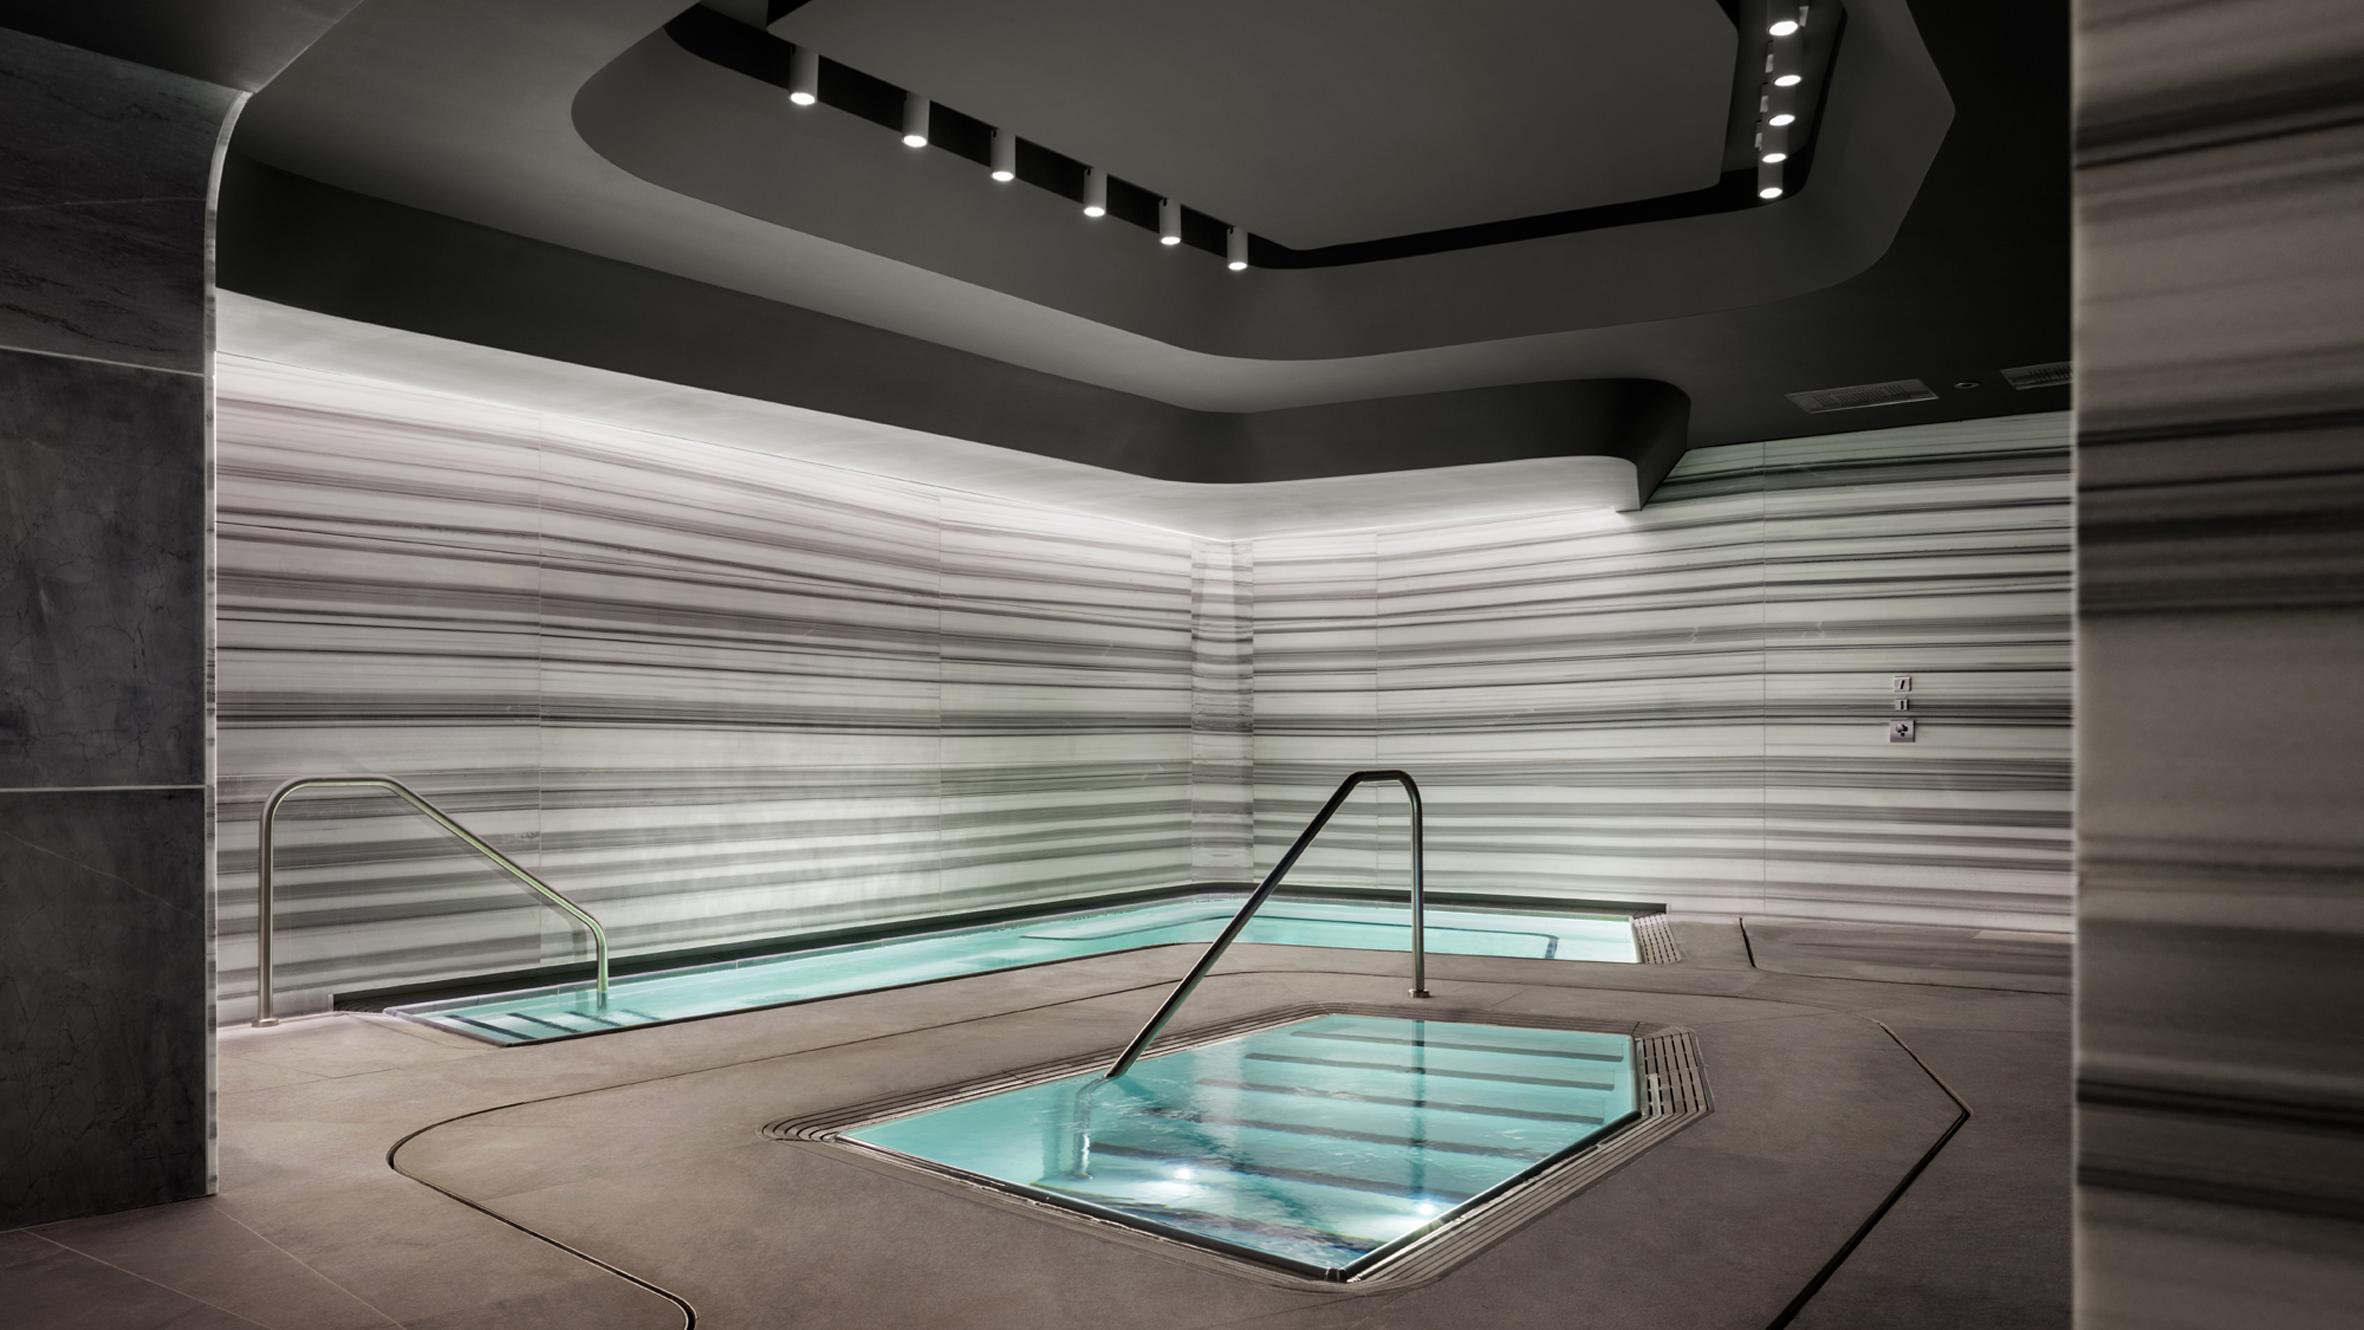 ... 520 W 28th Amenities By Zaha Hadid Architects